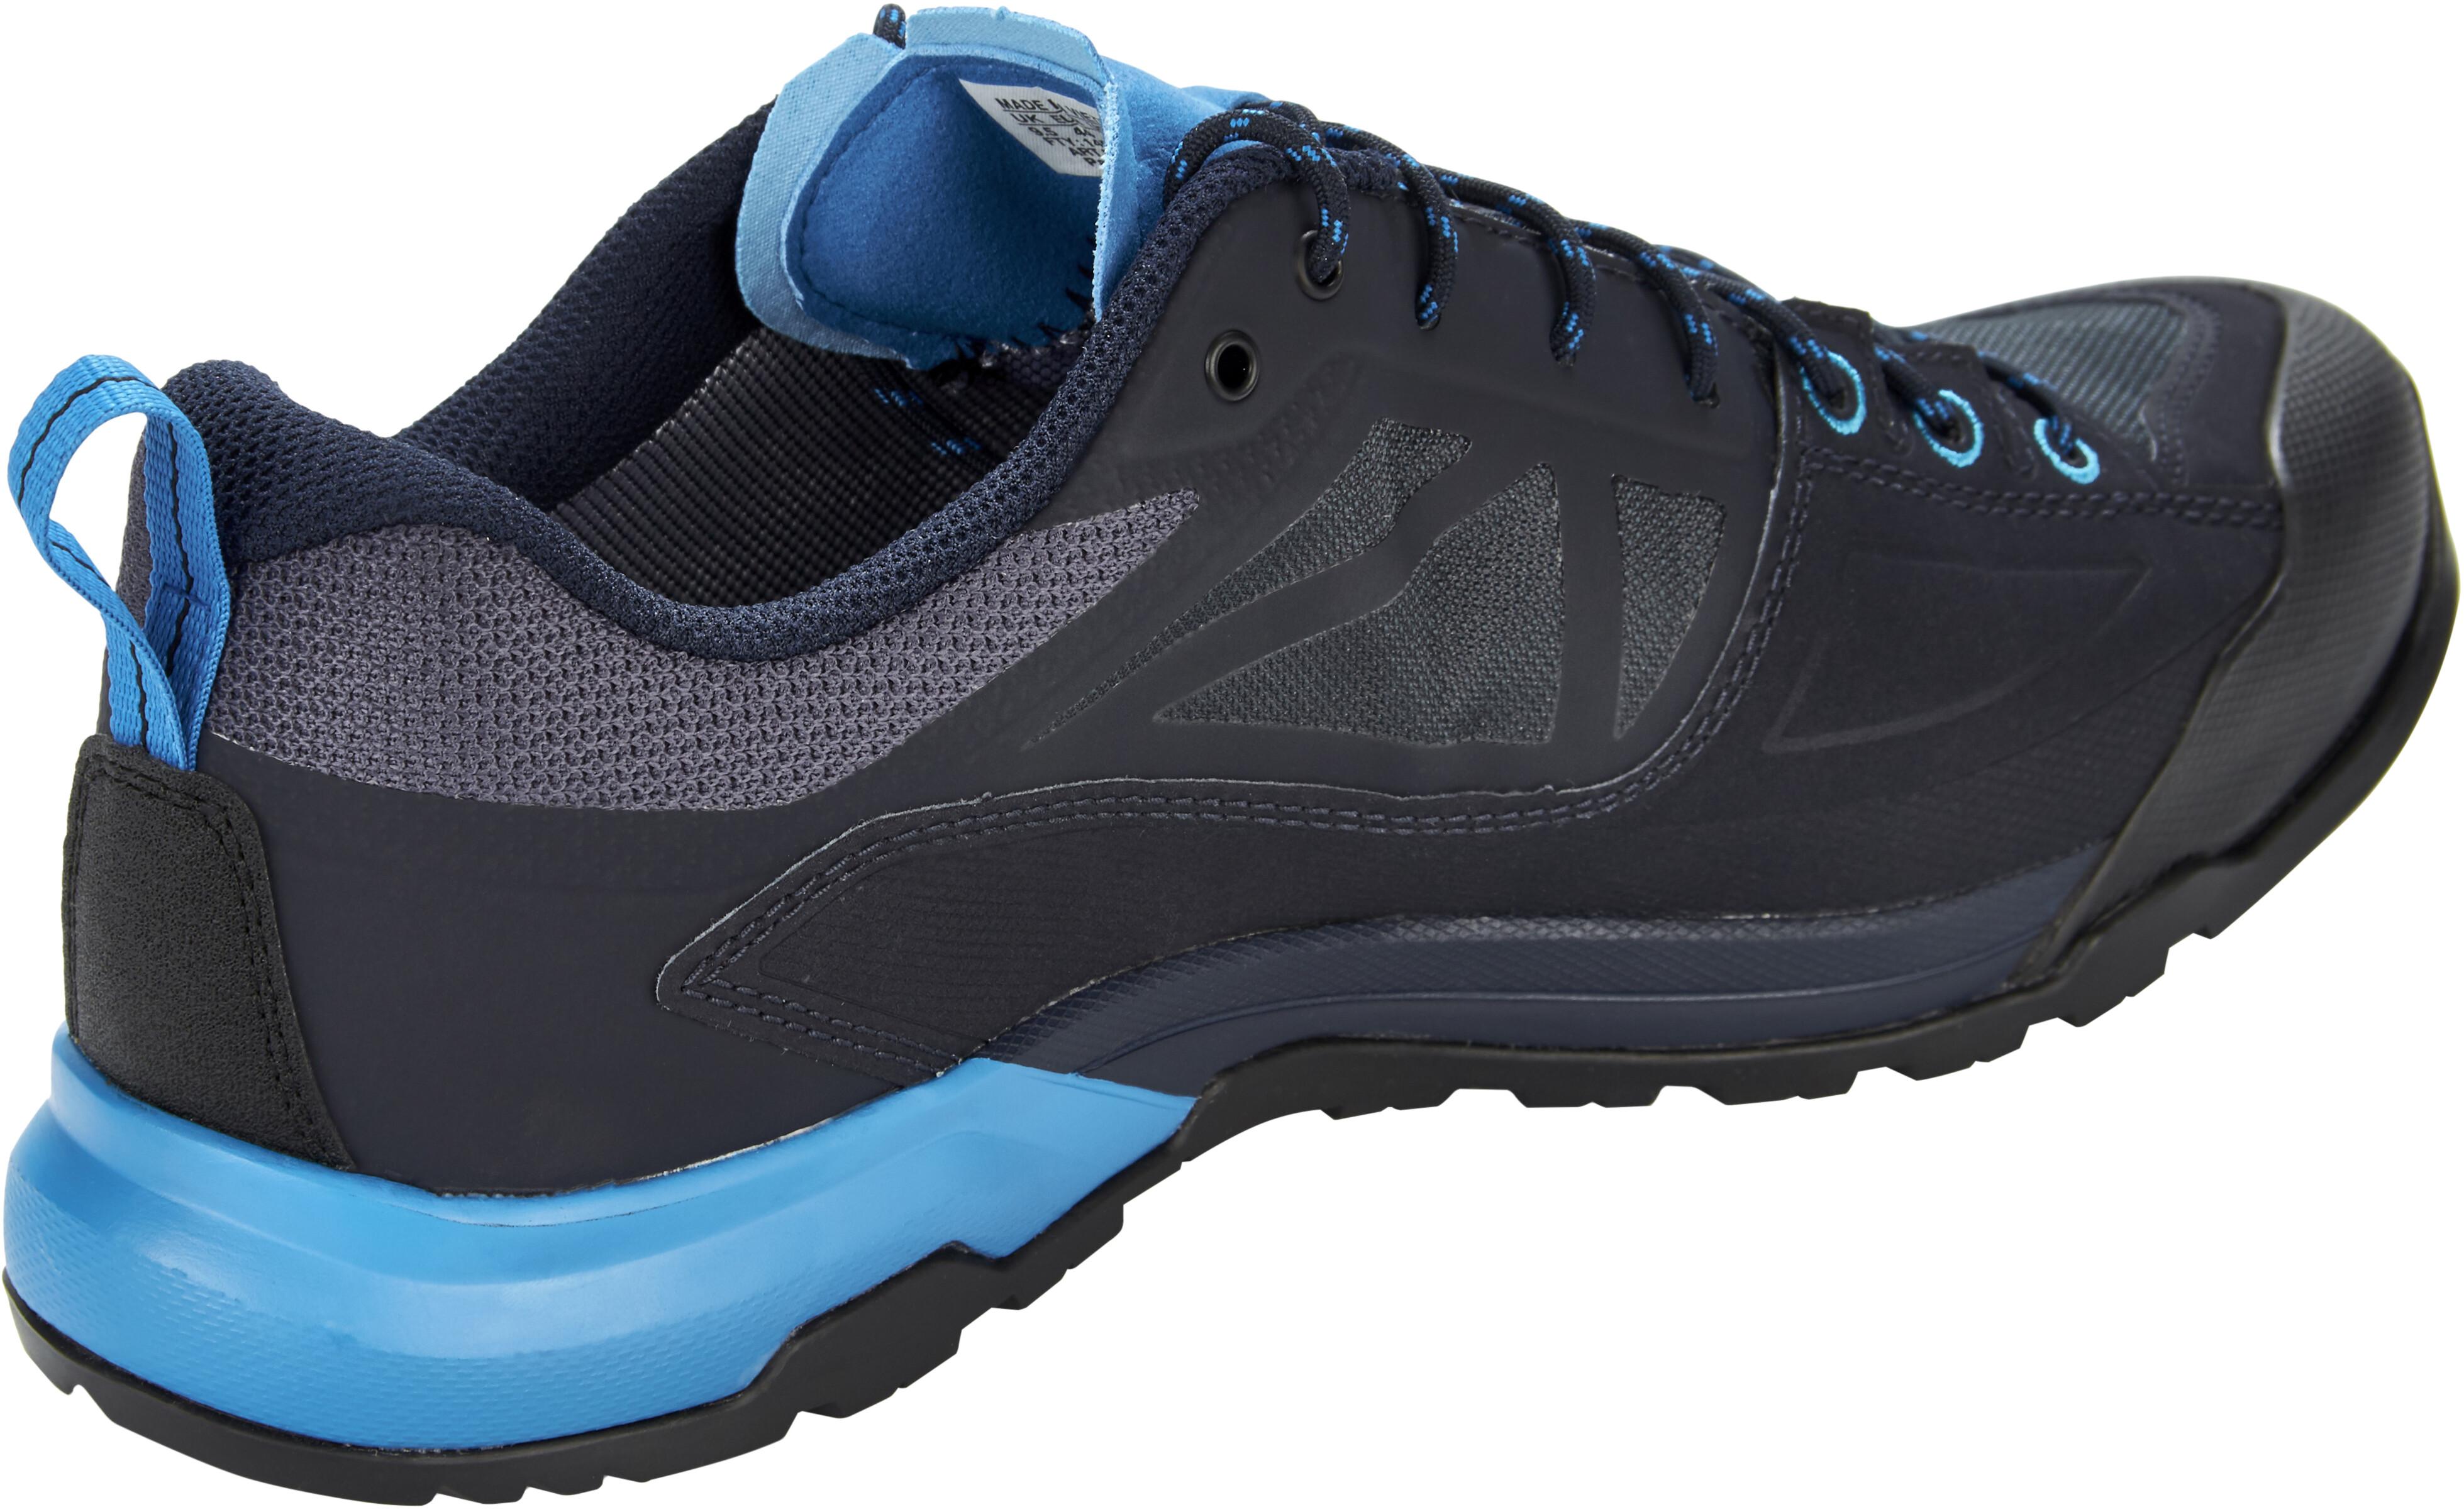 6a75949315da Salomon X Alp SPRY GTX Shoes Men blue at Addnature.co.uk